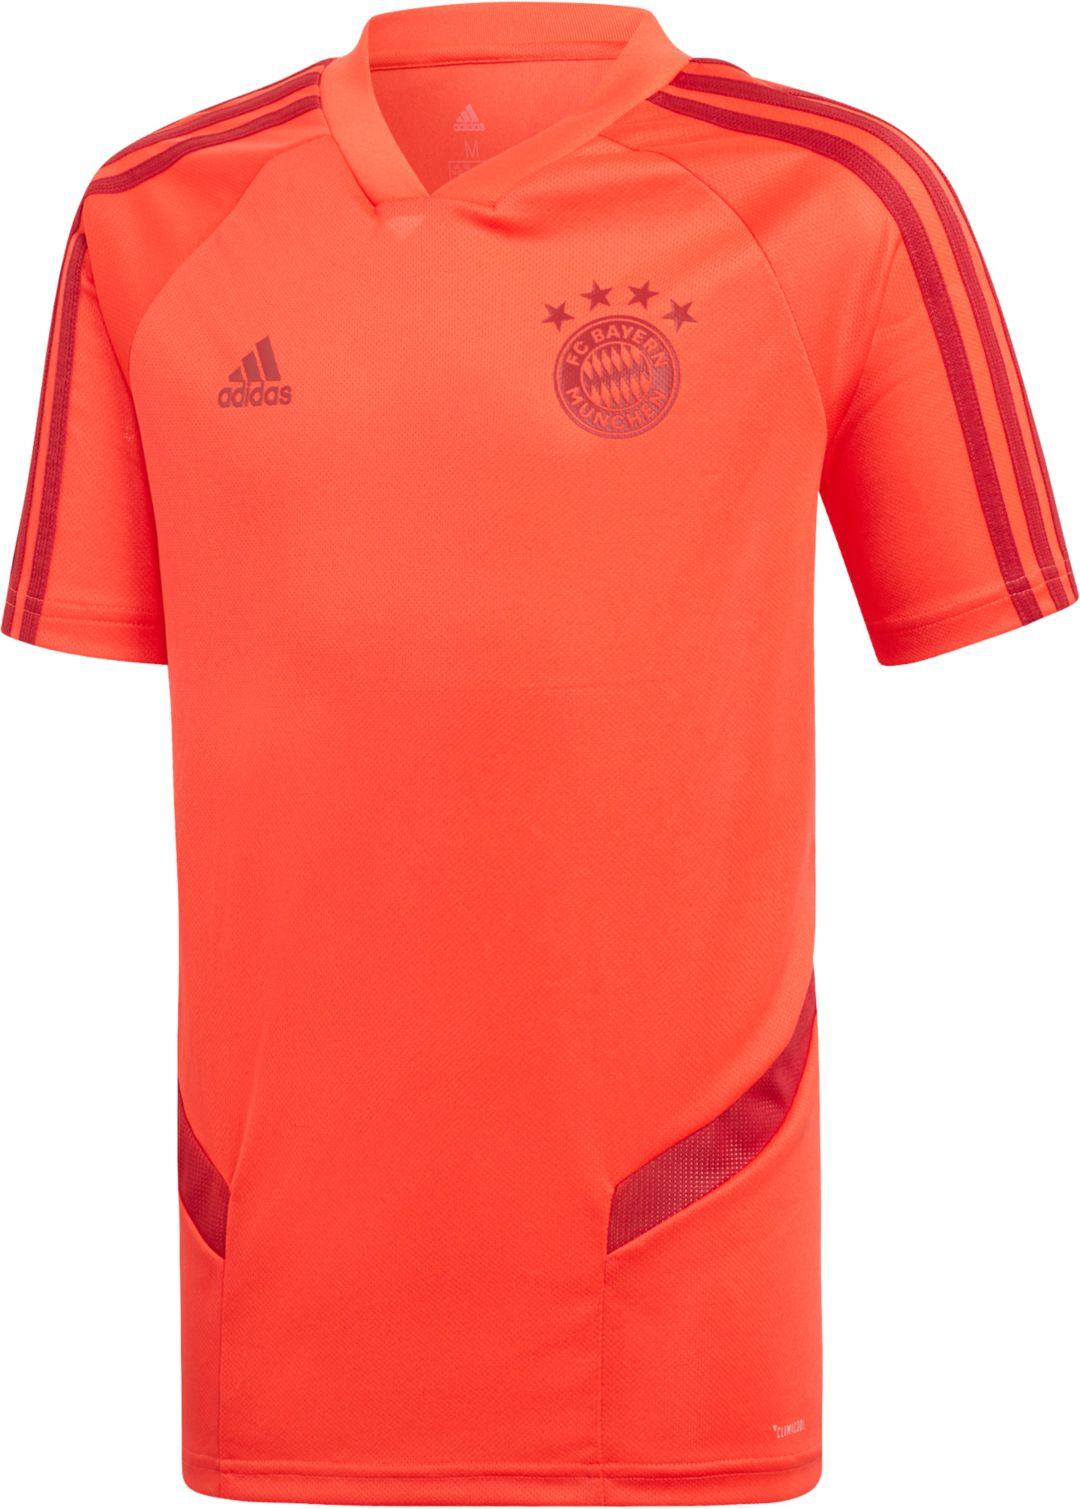 4db06670 adidas Youth Bayern Munich '19 Red Training Jersey | DICK'S Sporting ...